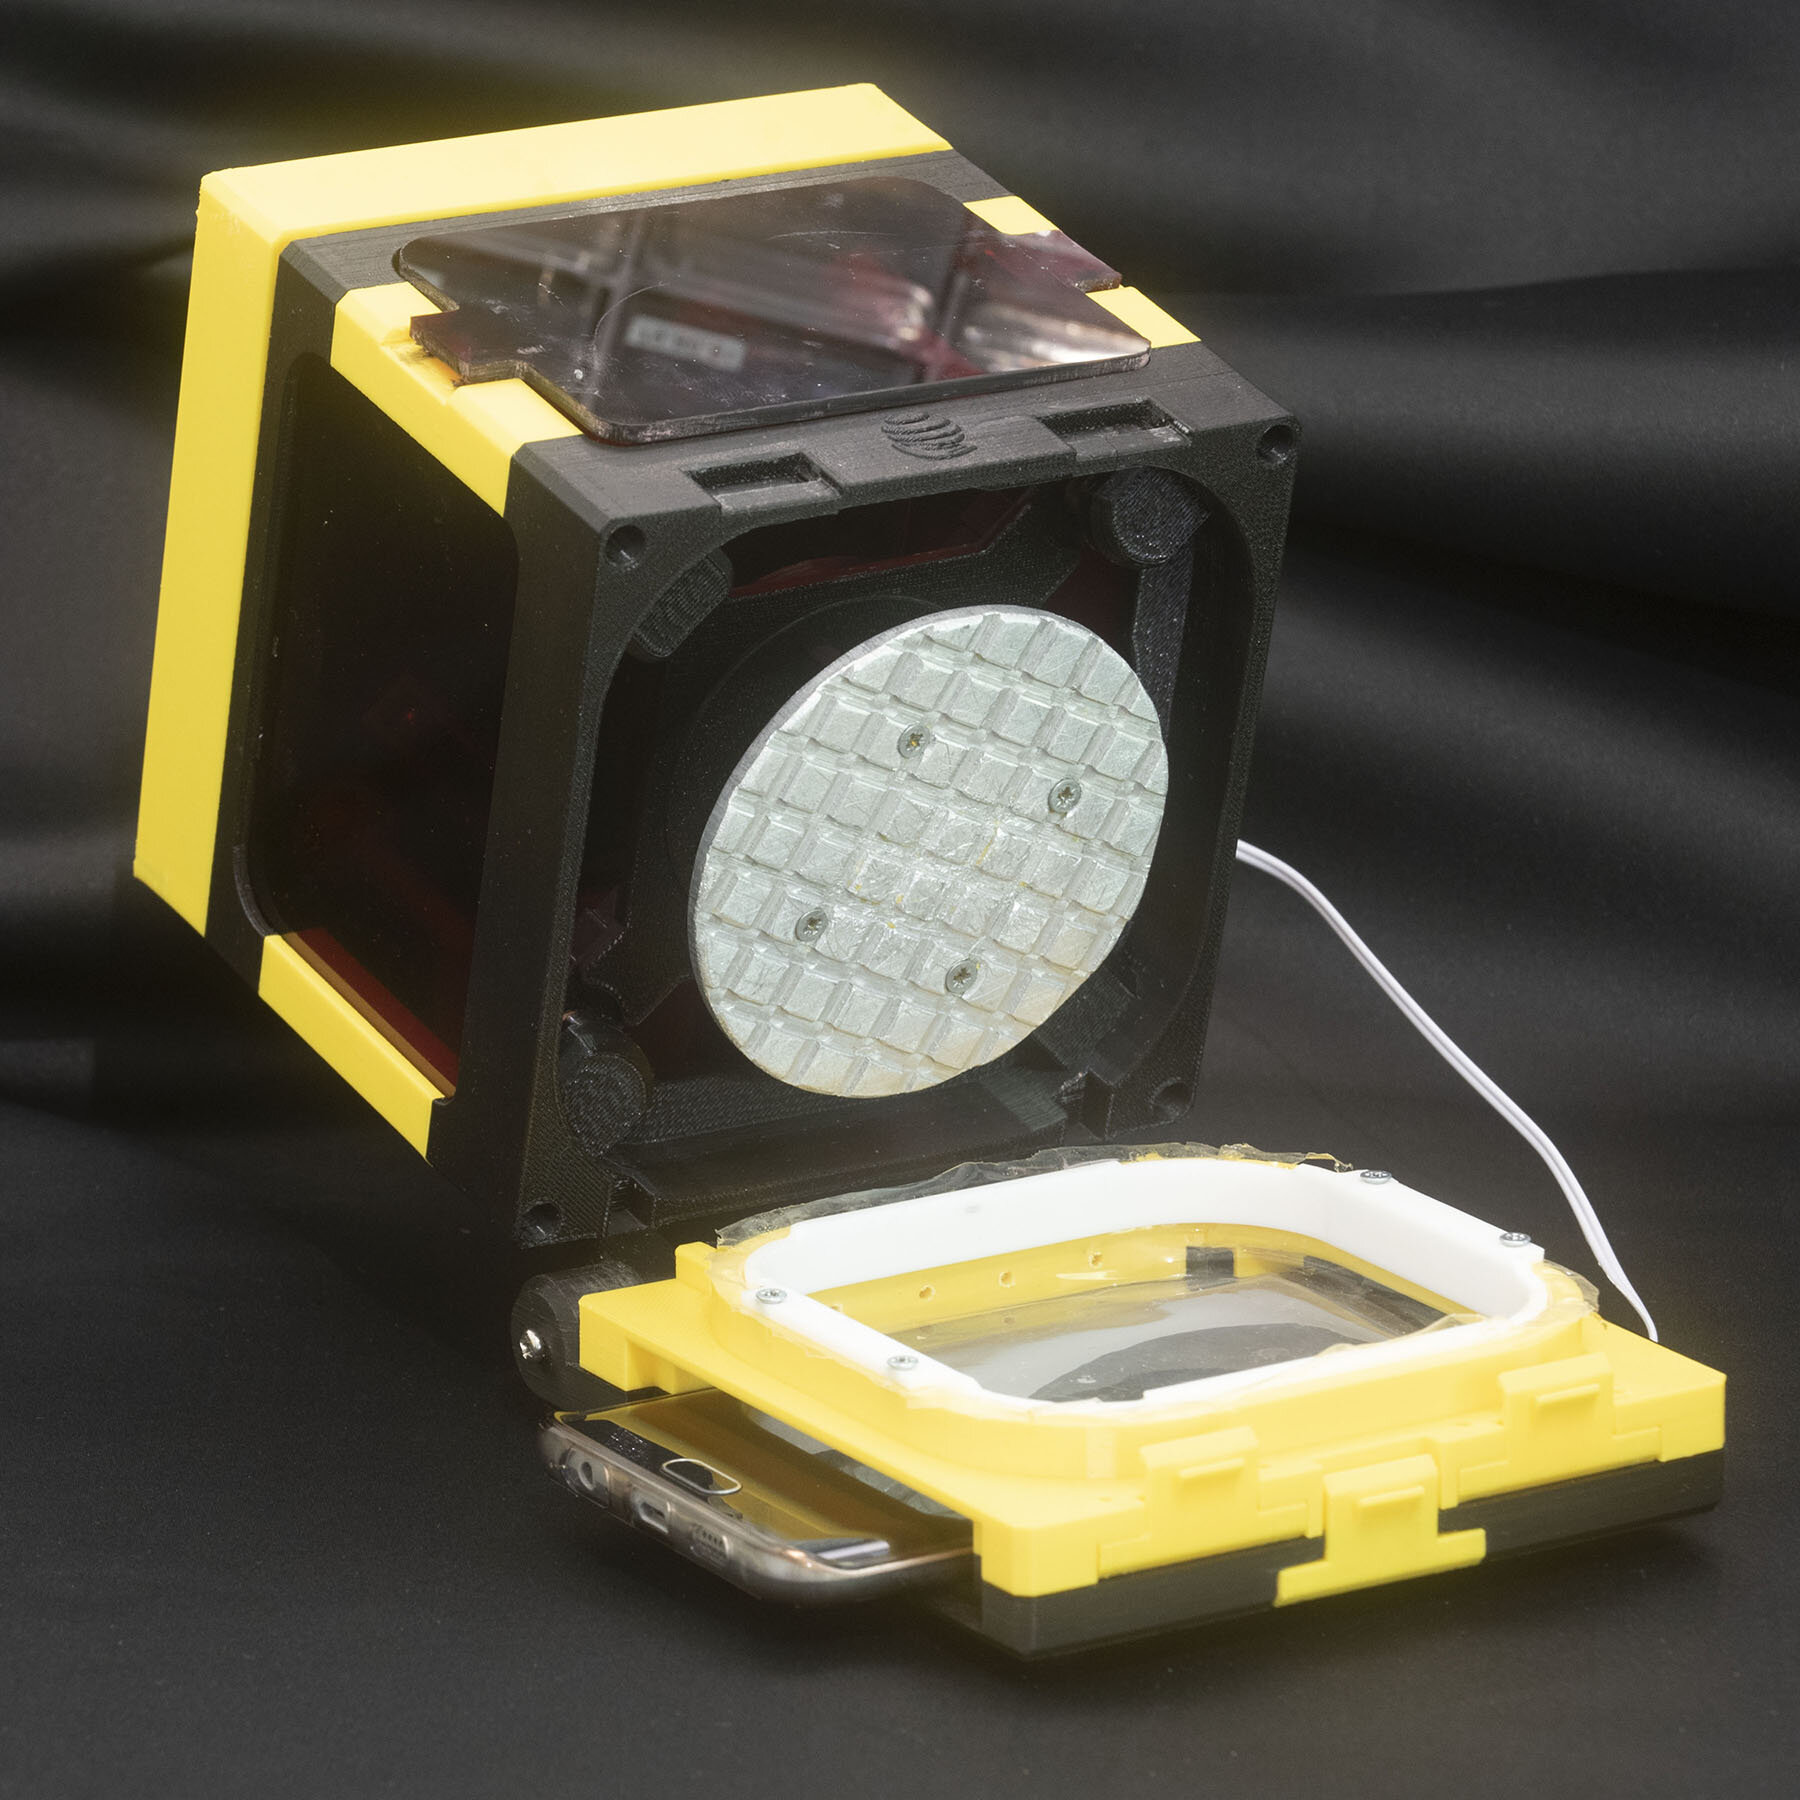 LumiBee DIY 3D printer